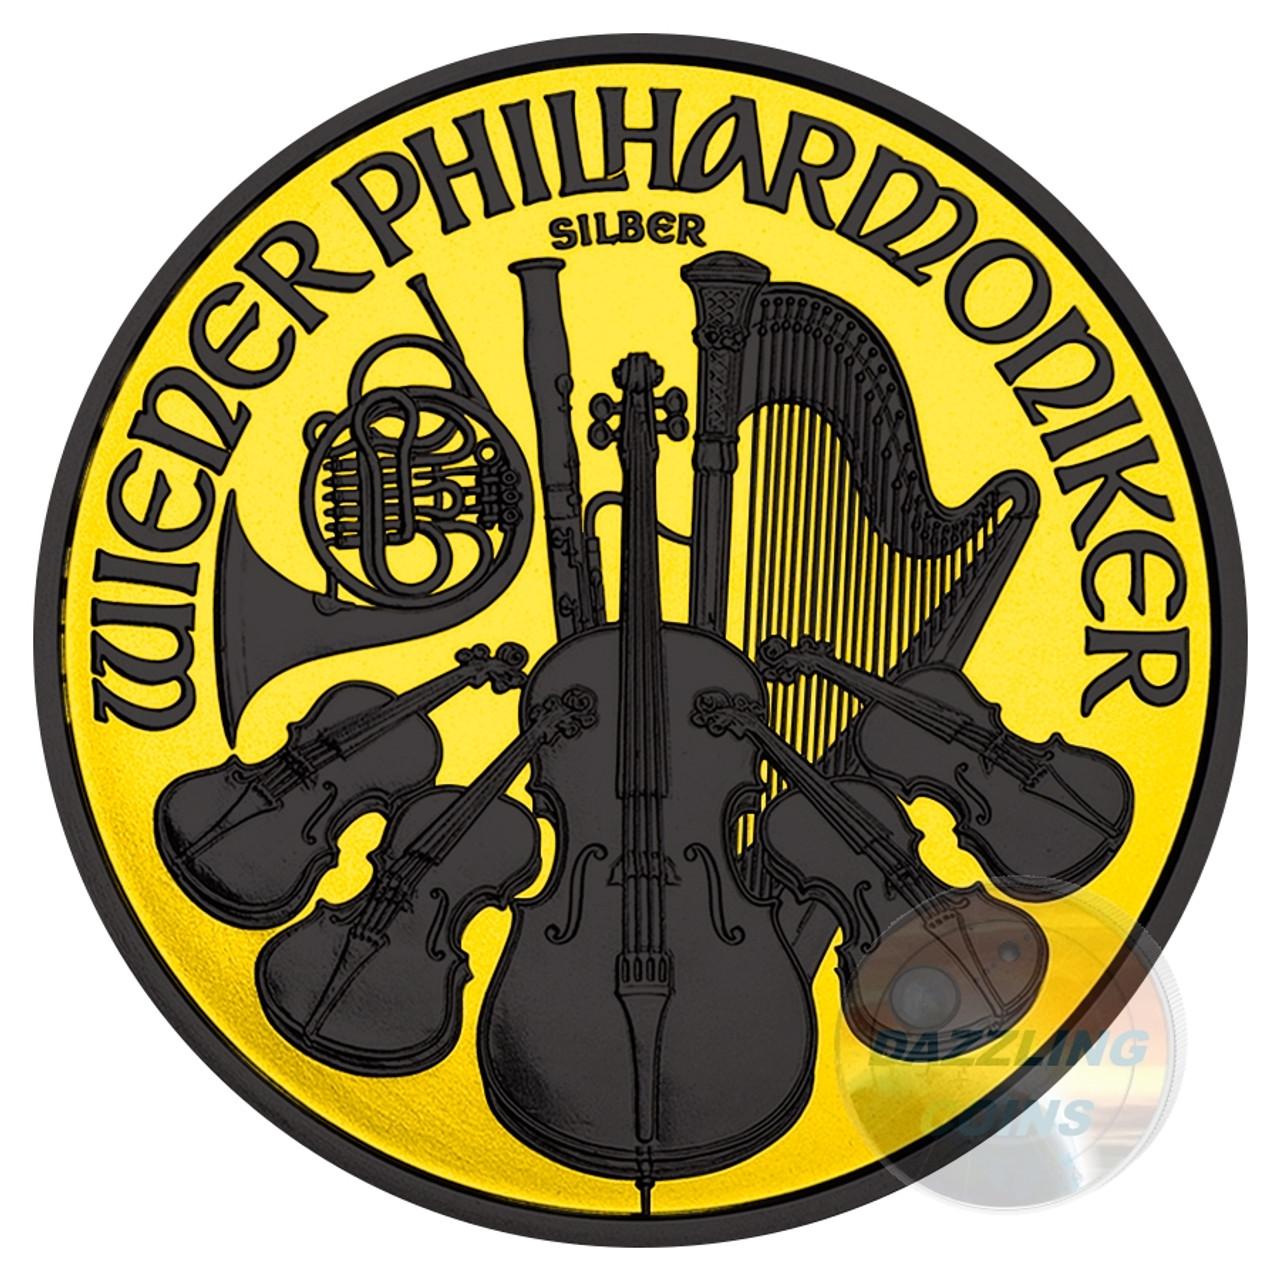 2014 austria philharmonic gilded 1 5 euro 1oz silver coin for Wohndesign pure vienna 2014